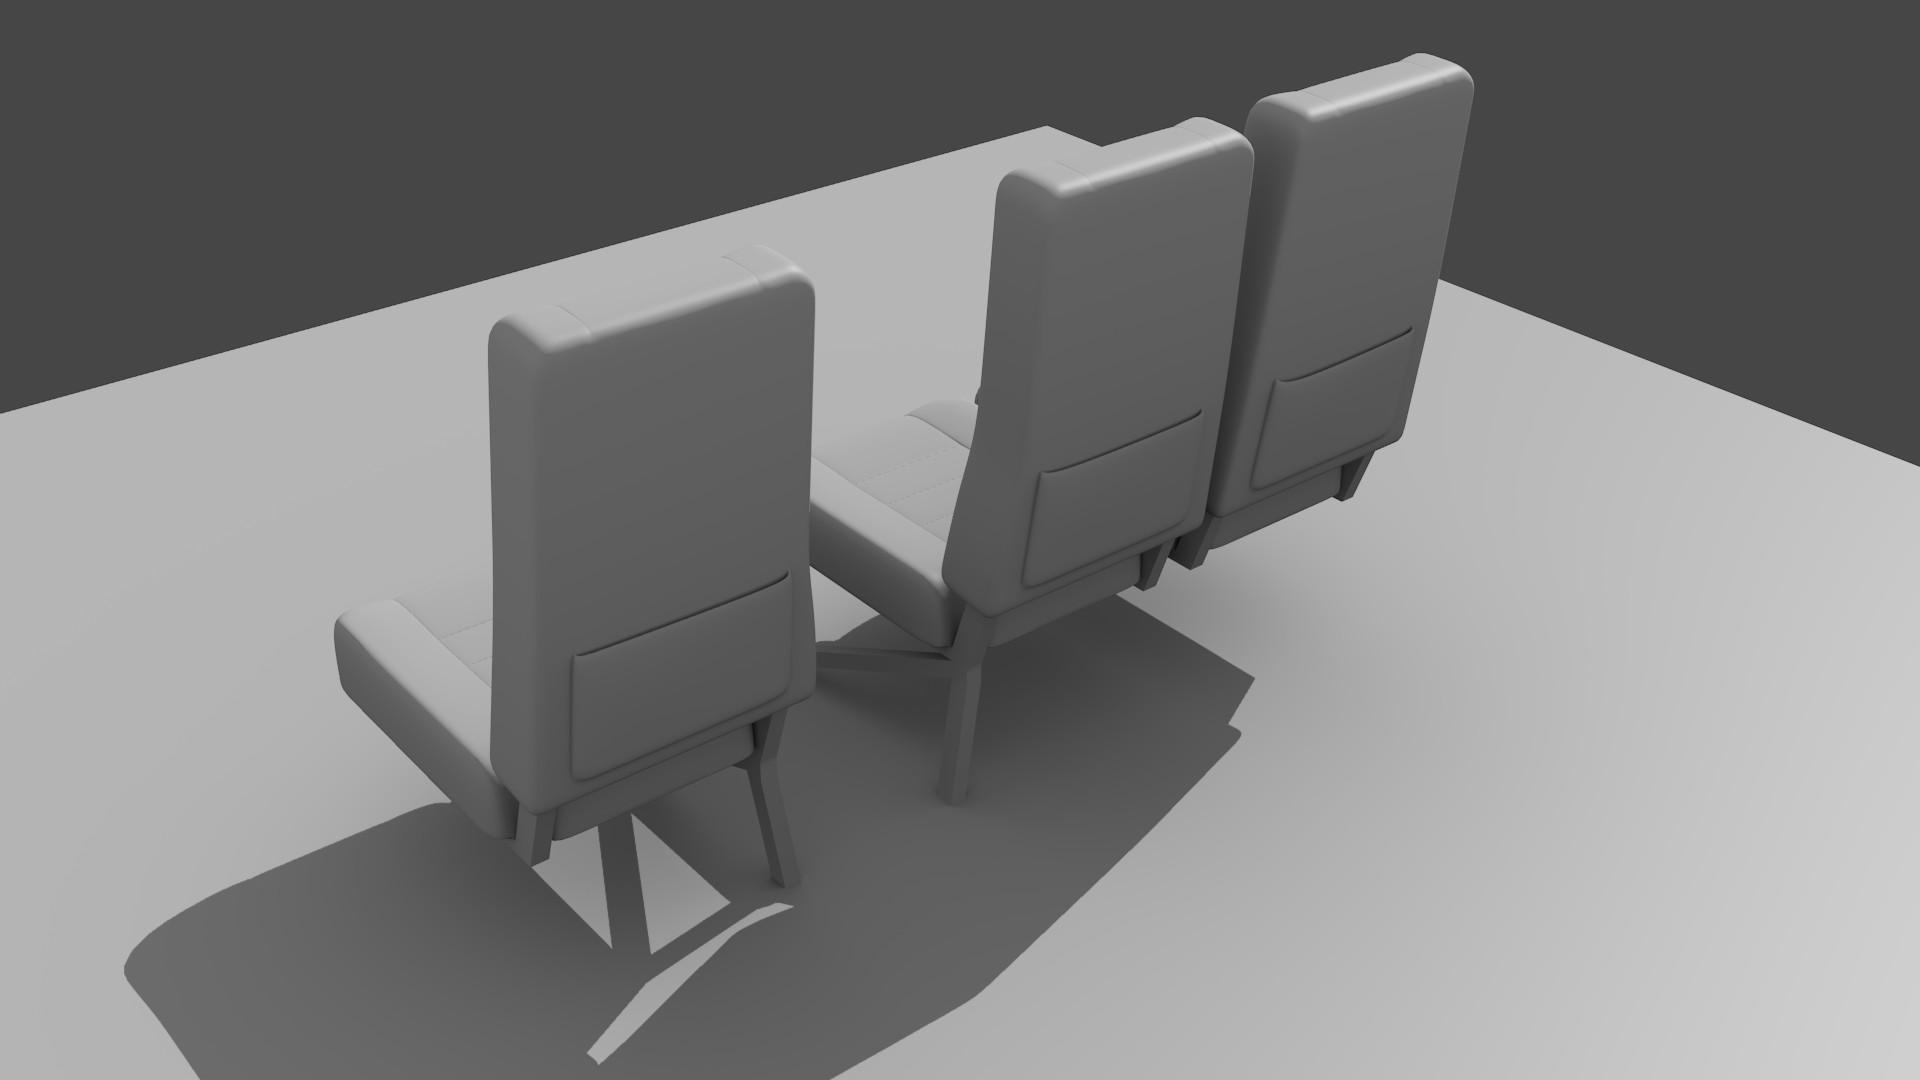 passenger_seat_render_3.jpg